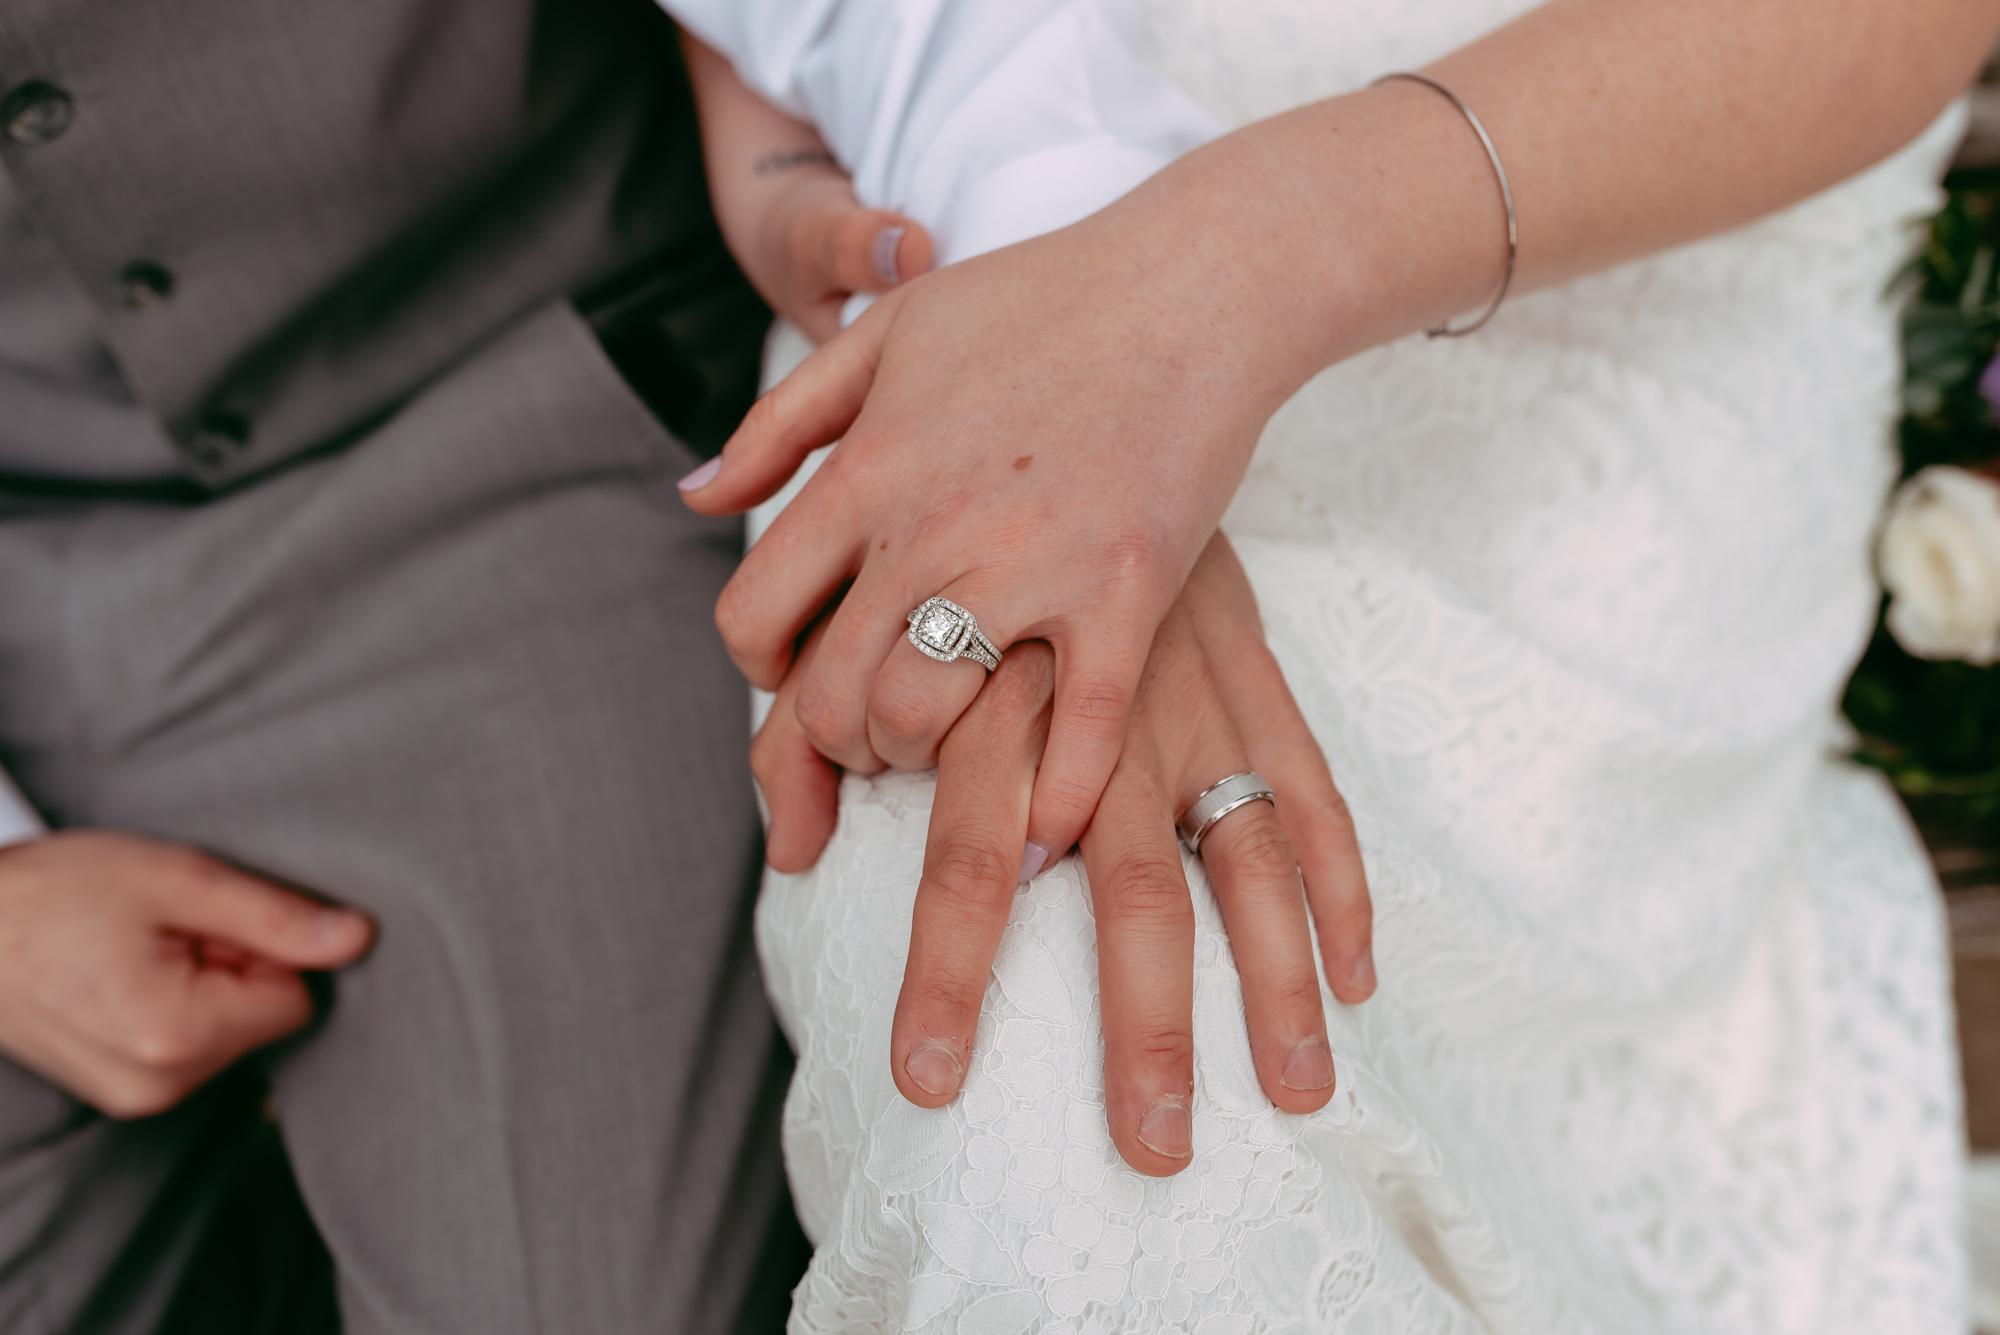 prairie-street-brewhouse-wedding-Rockford-IL-wedding-photographers-215.jpg